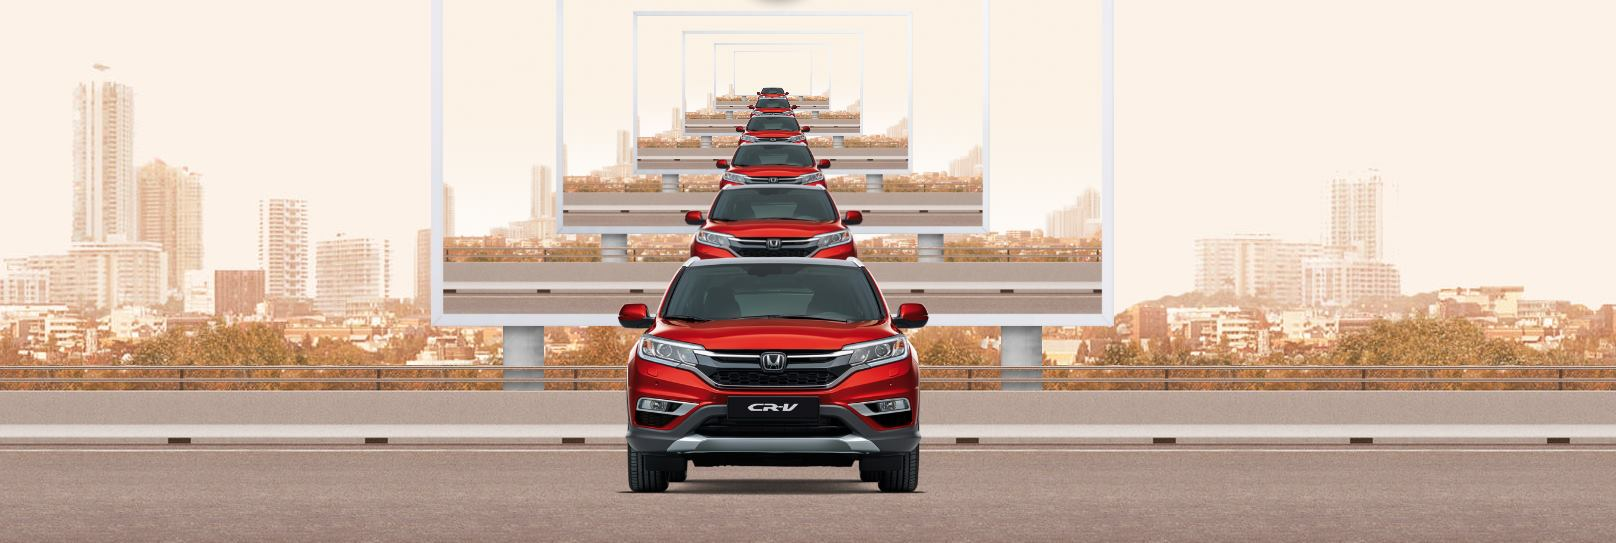 Jedan od najpopularnijih SUV modela Honda CR-V 2.0 i-VTEC 2WD Comfort